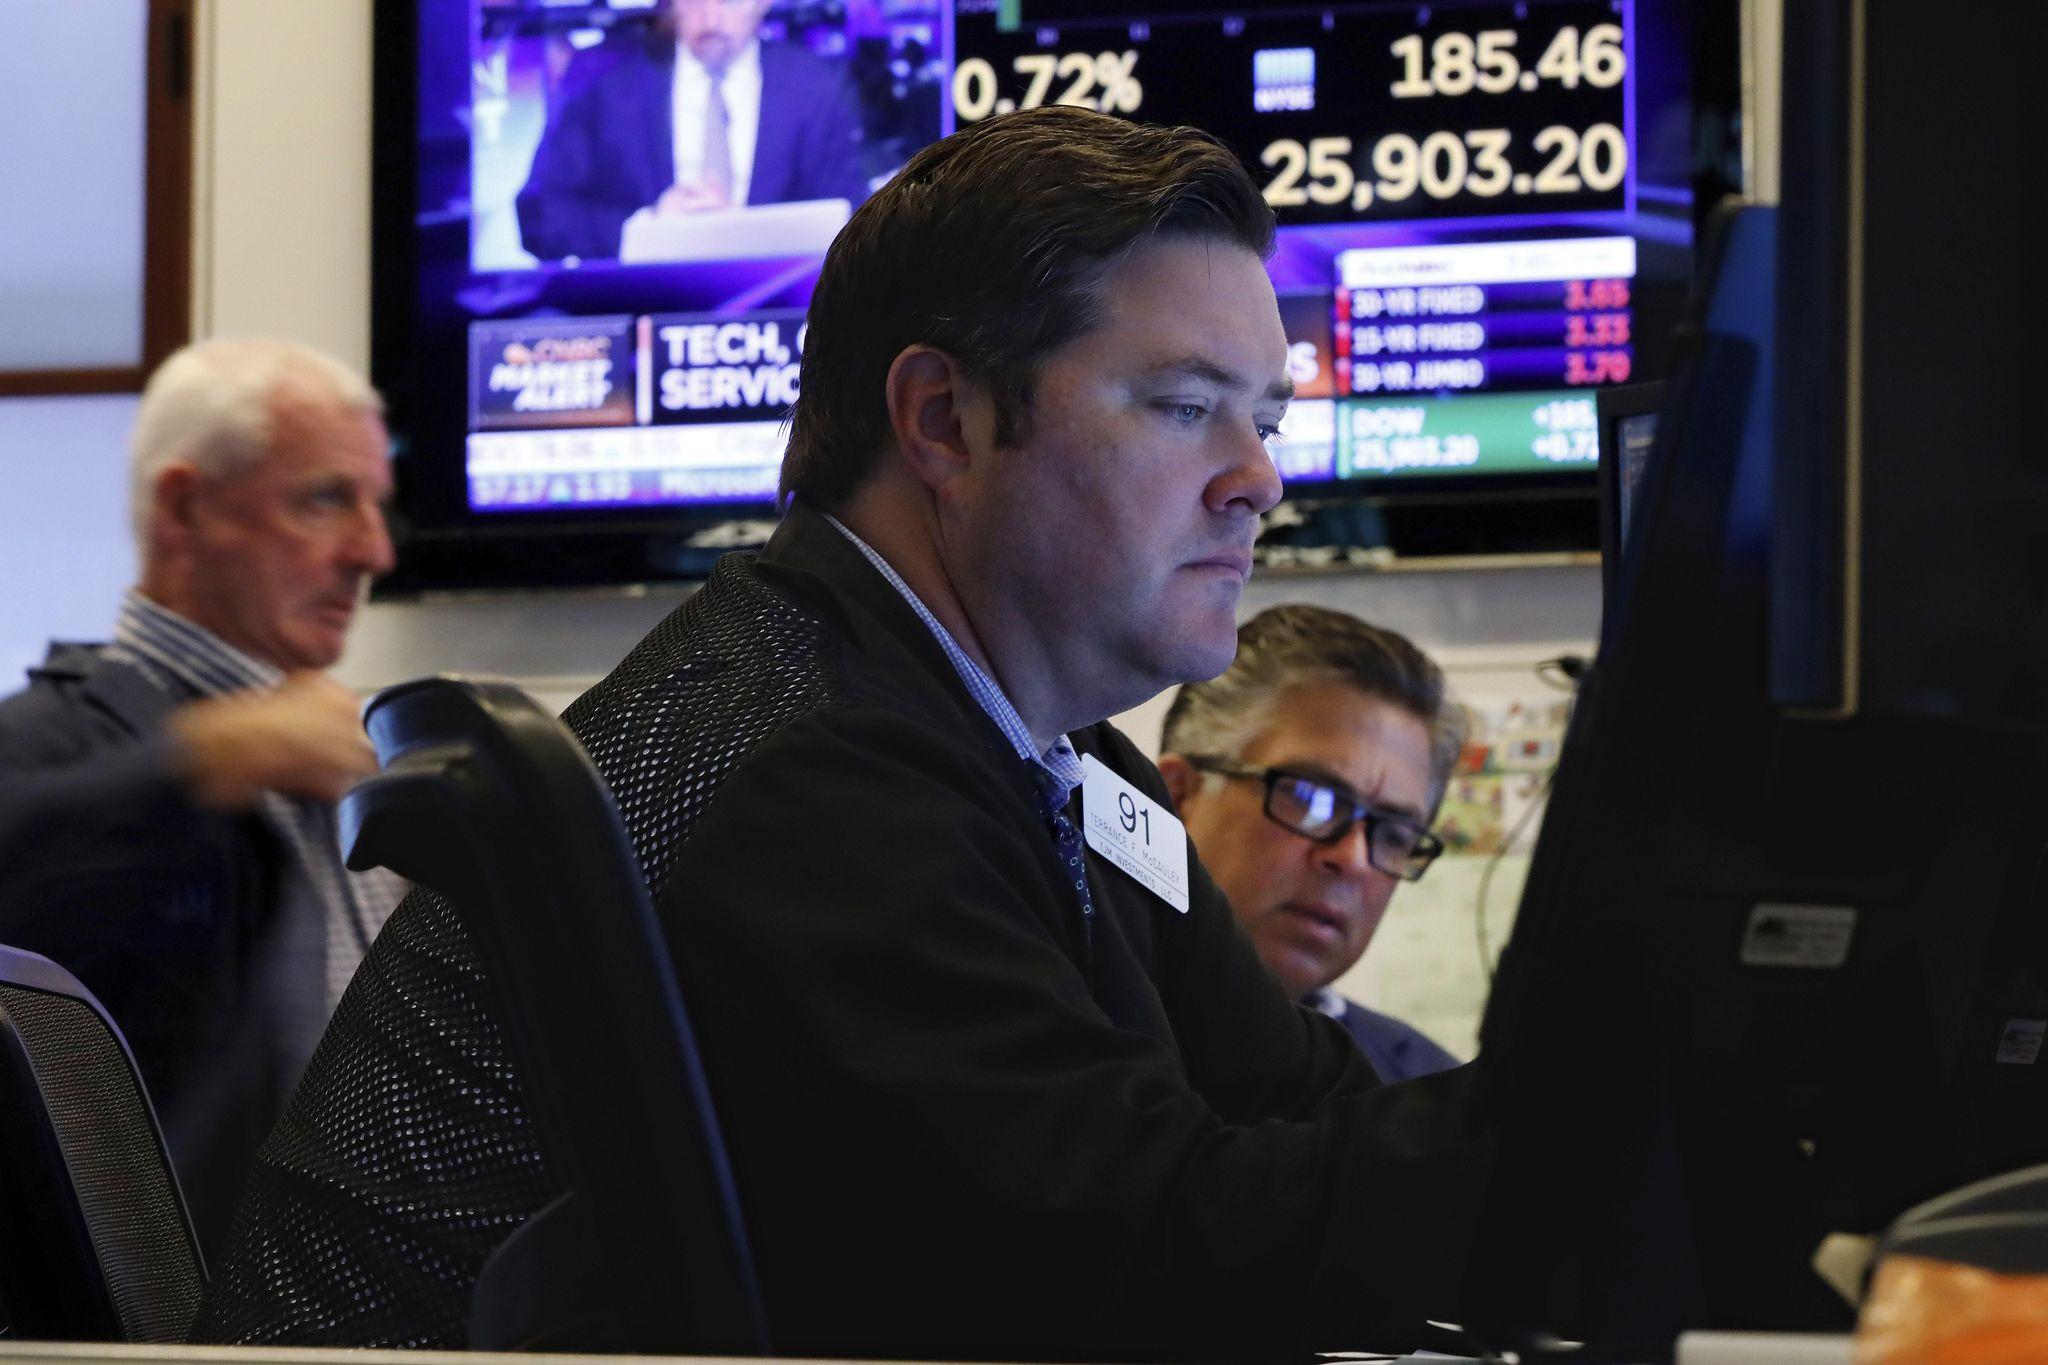 Donald Trump delays China tariffs until December, markets higher